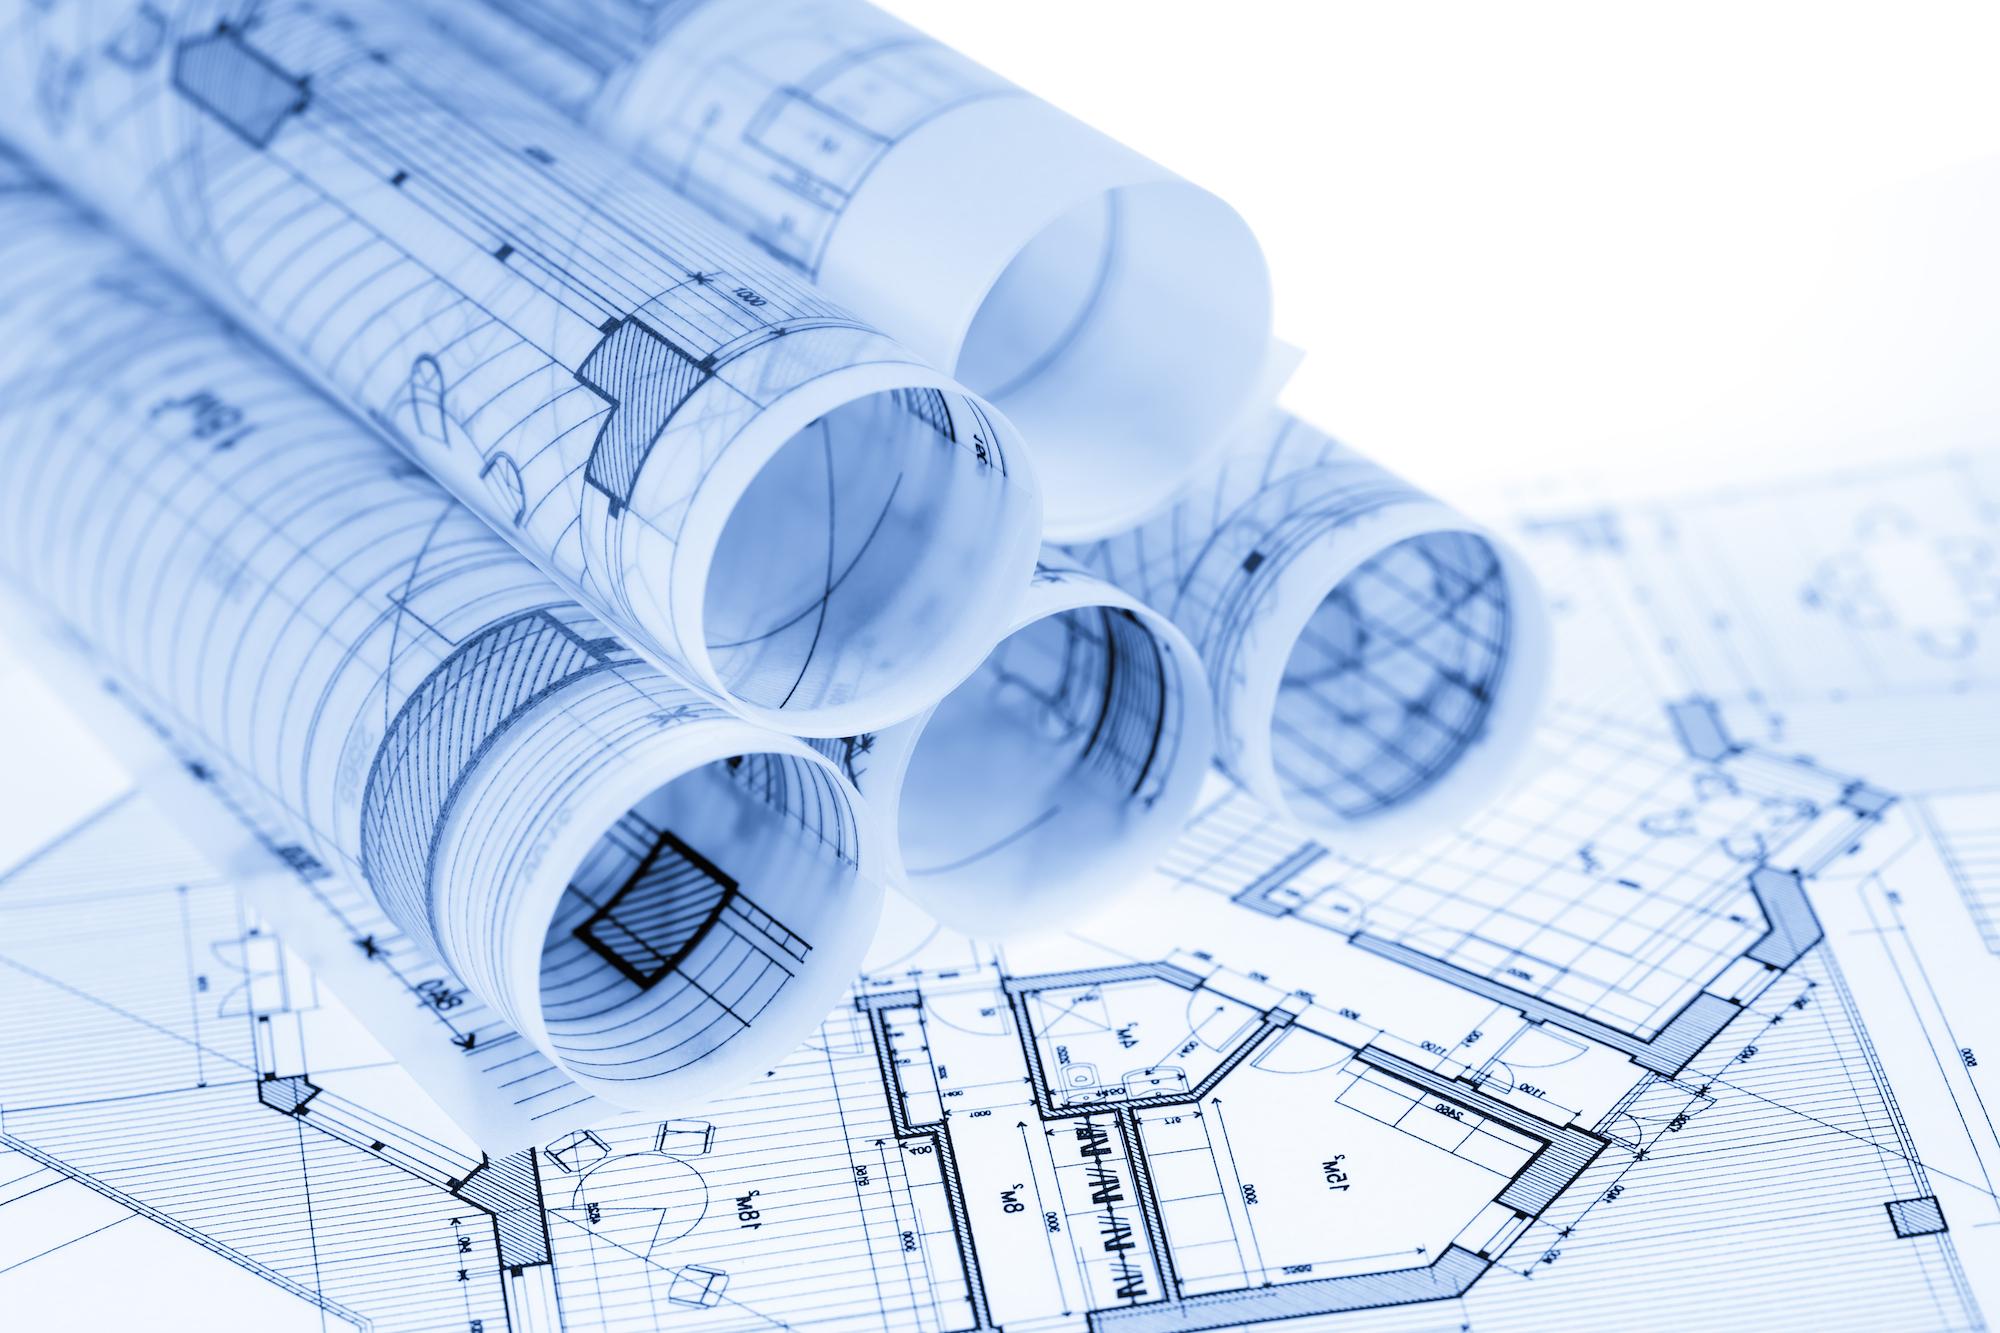 Rolls of architecture blueprints house plans marino investments rolls of architecture blueprints house plans malvernweather Images